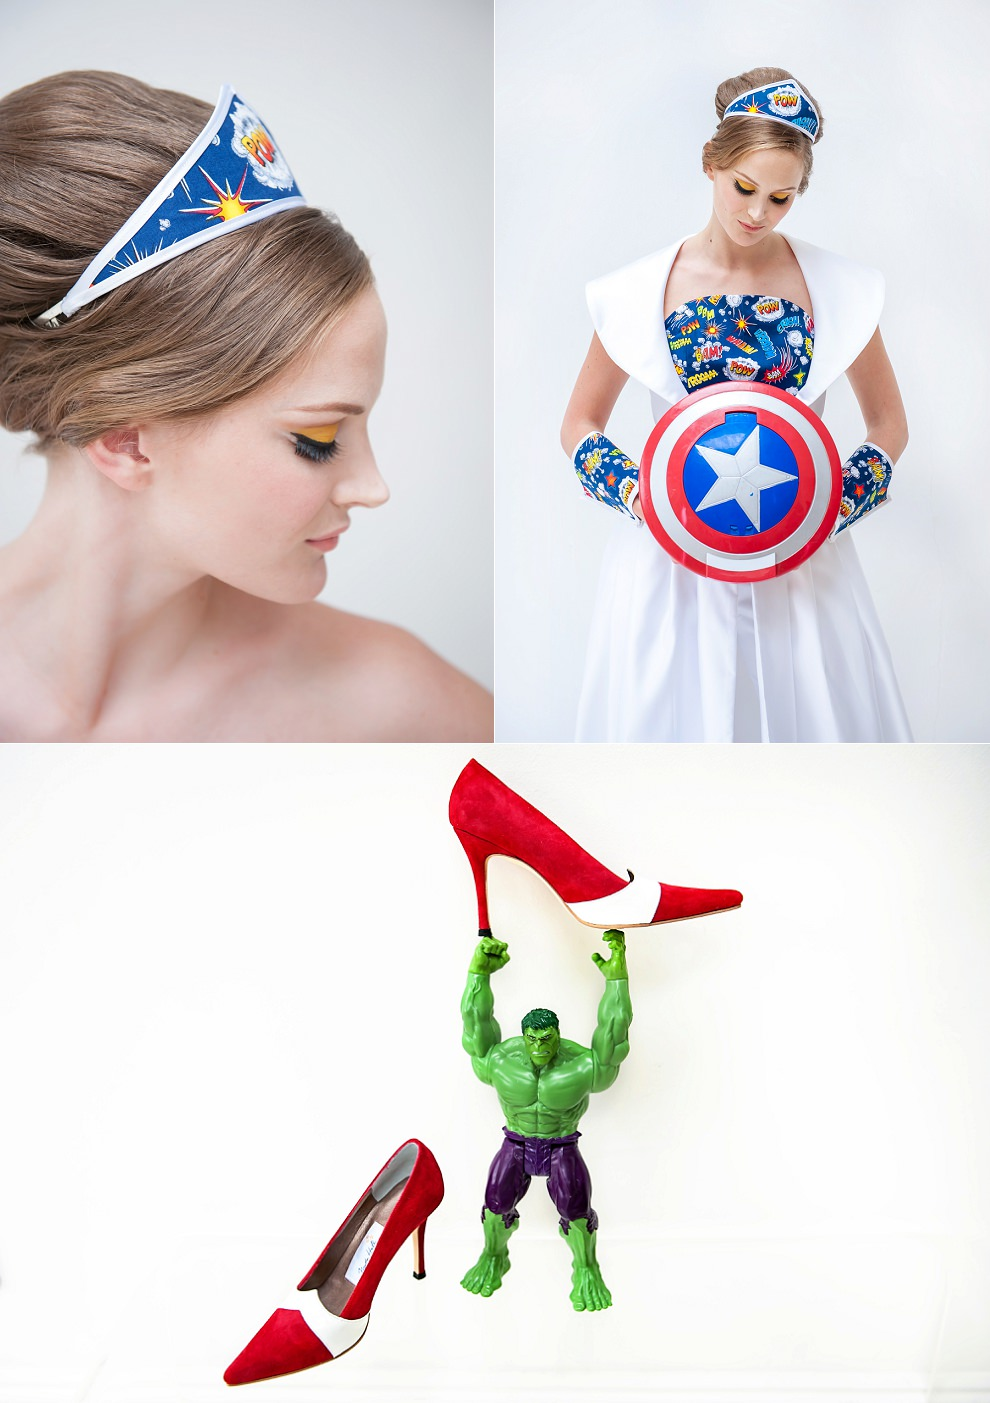 Geek-Chic-Superhero-30